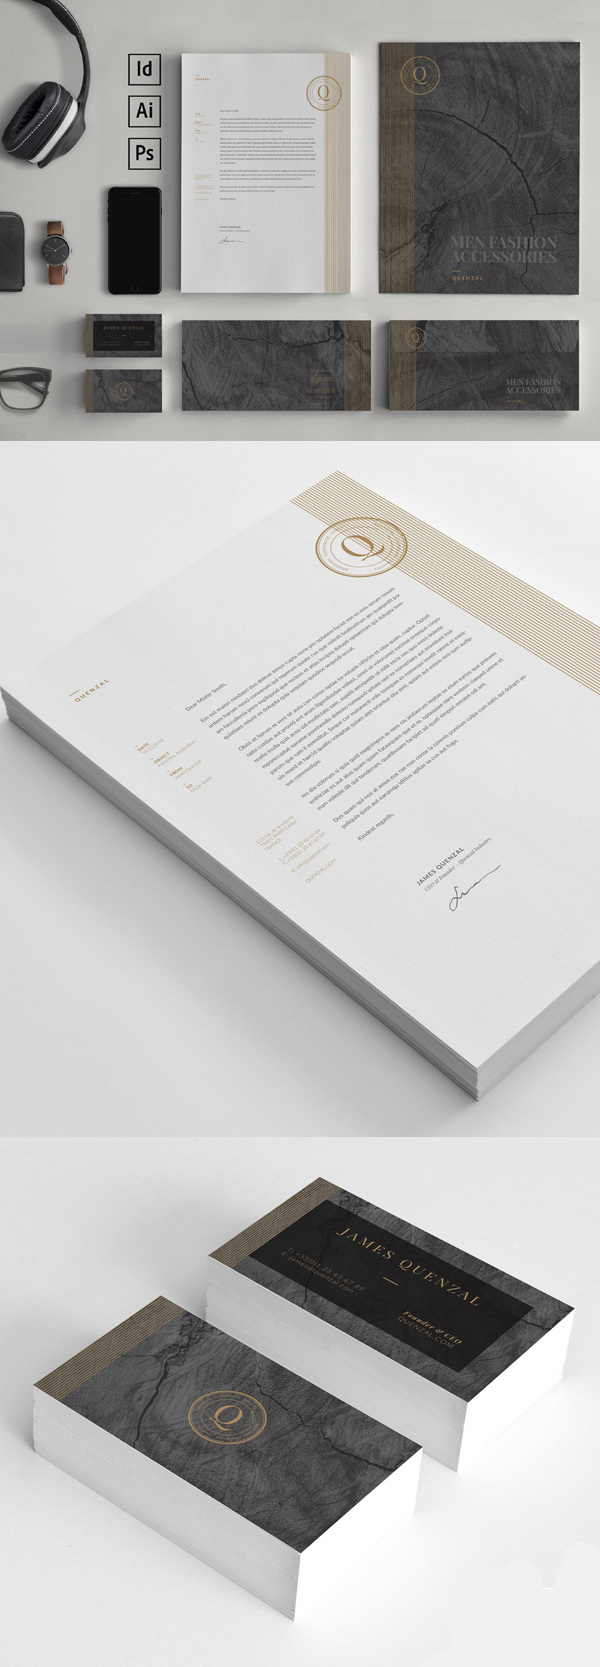 Modern Business Branding / Stationery Templates Design - 3